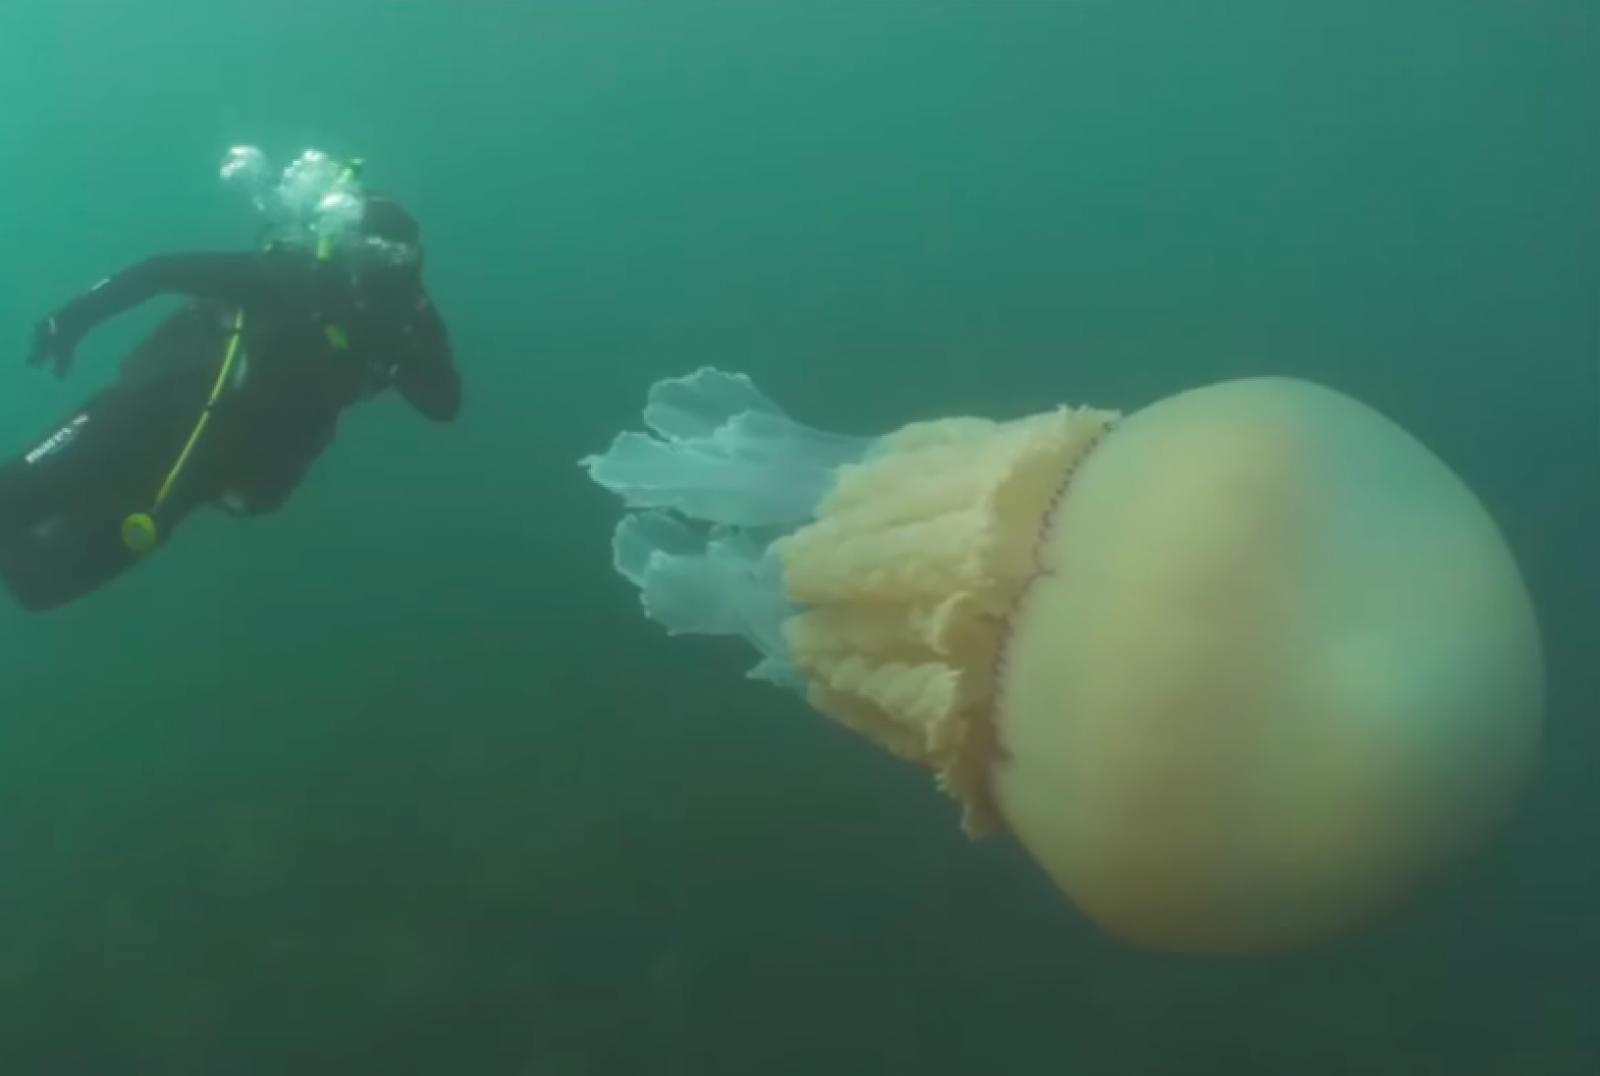 Lizzie Daly i la medusa gegant